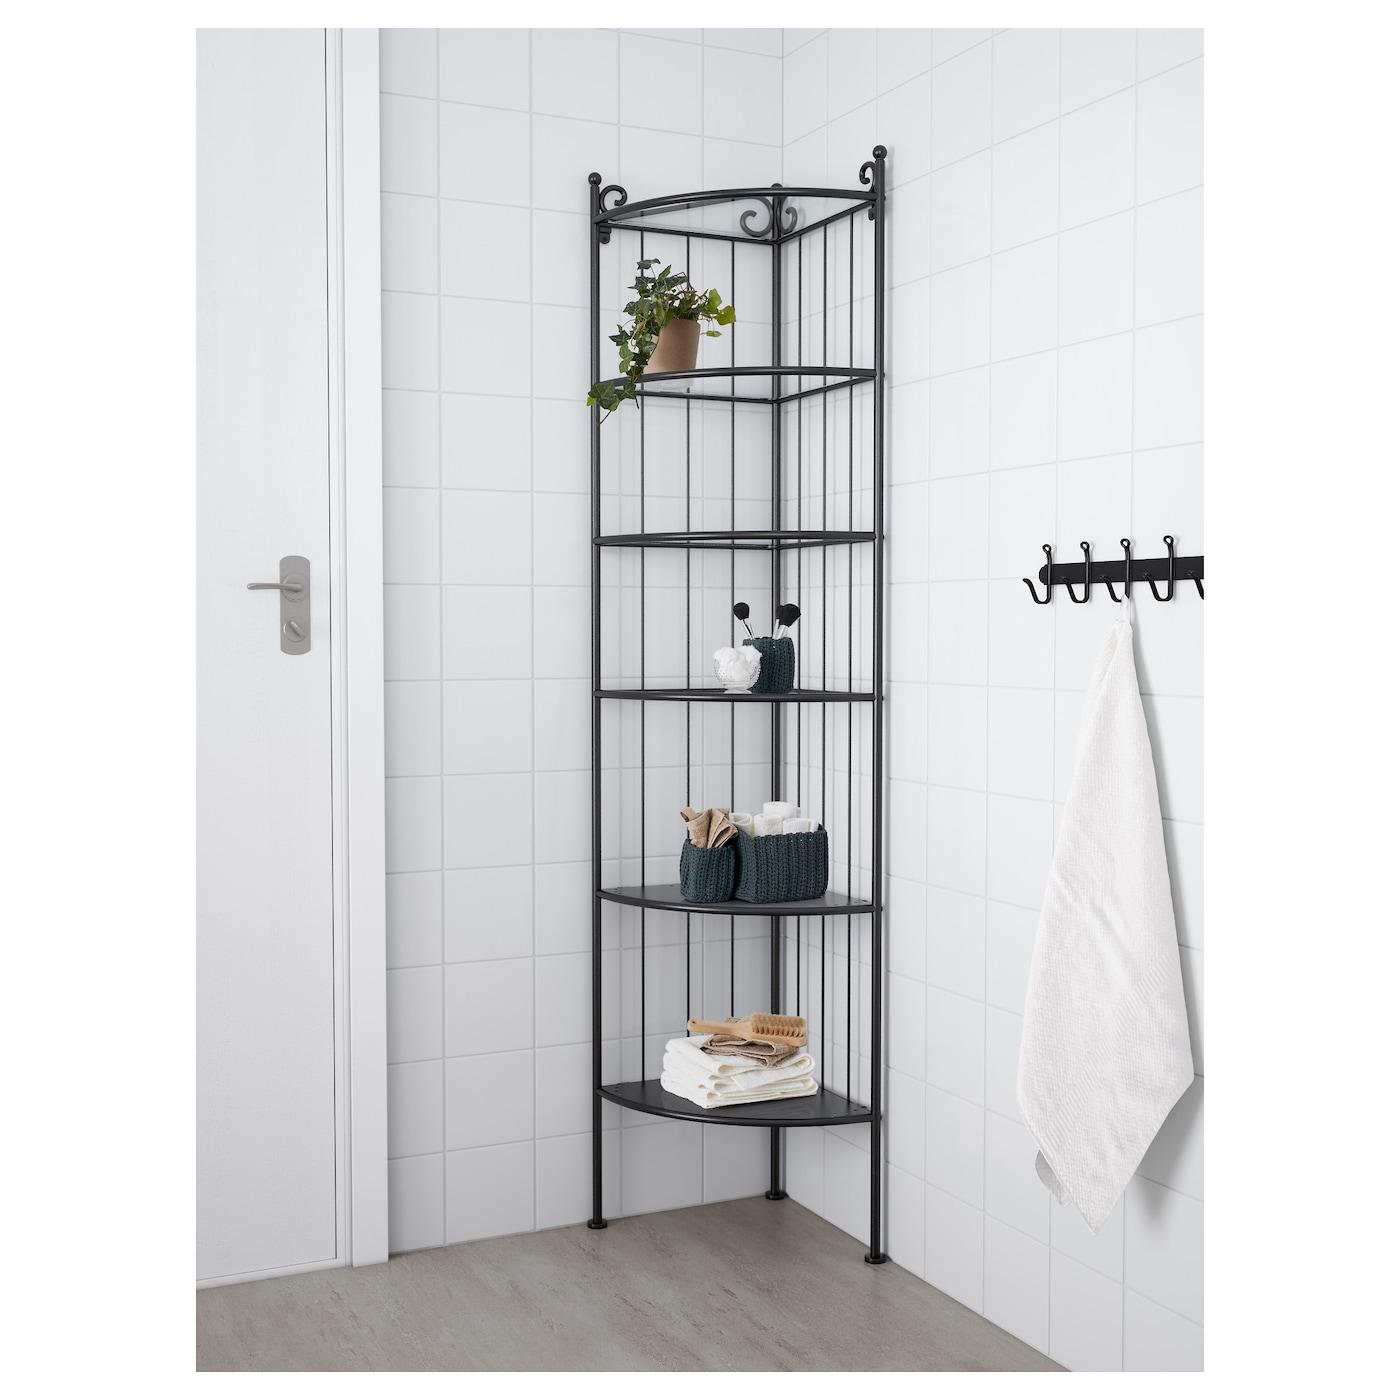 R nnsk r corner shelf unit black ikea for Bathroom shelves ikea